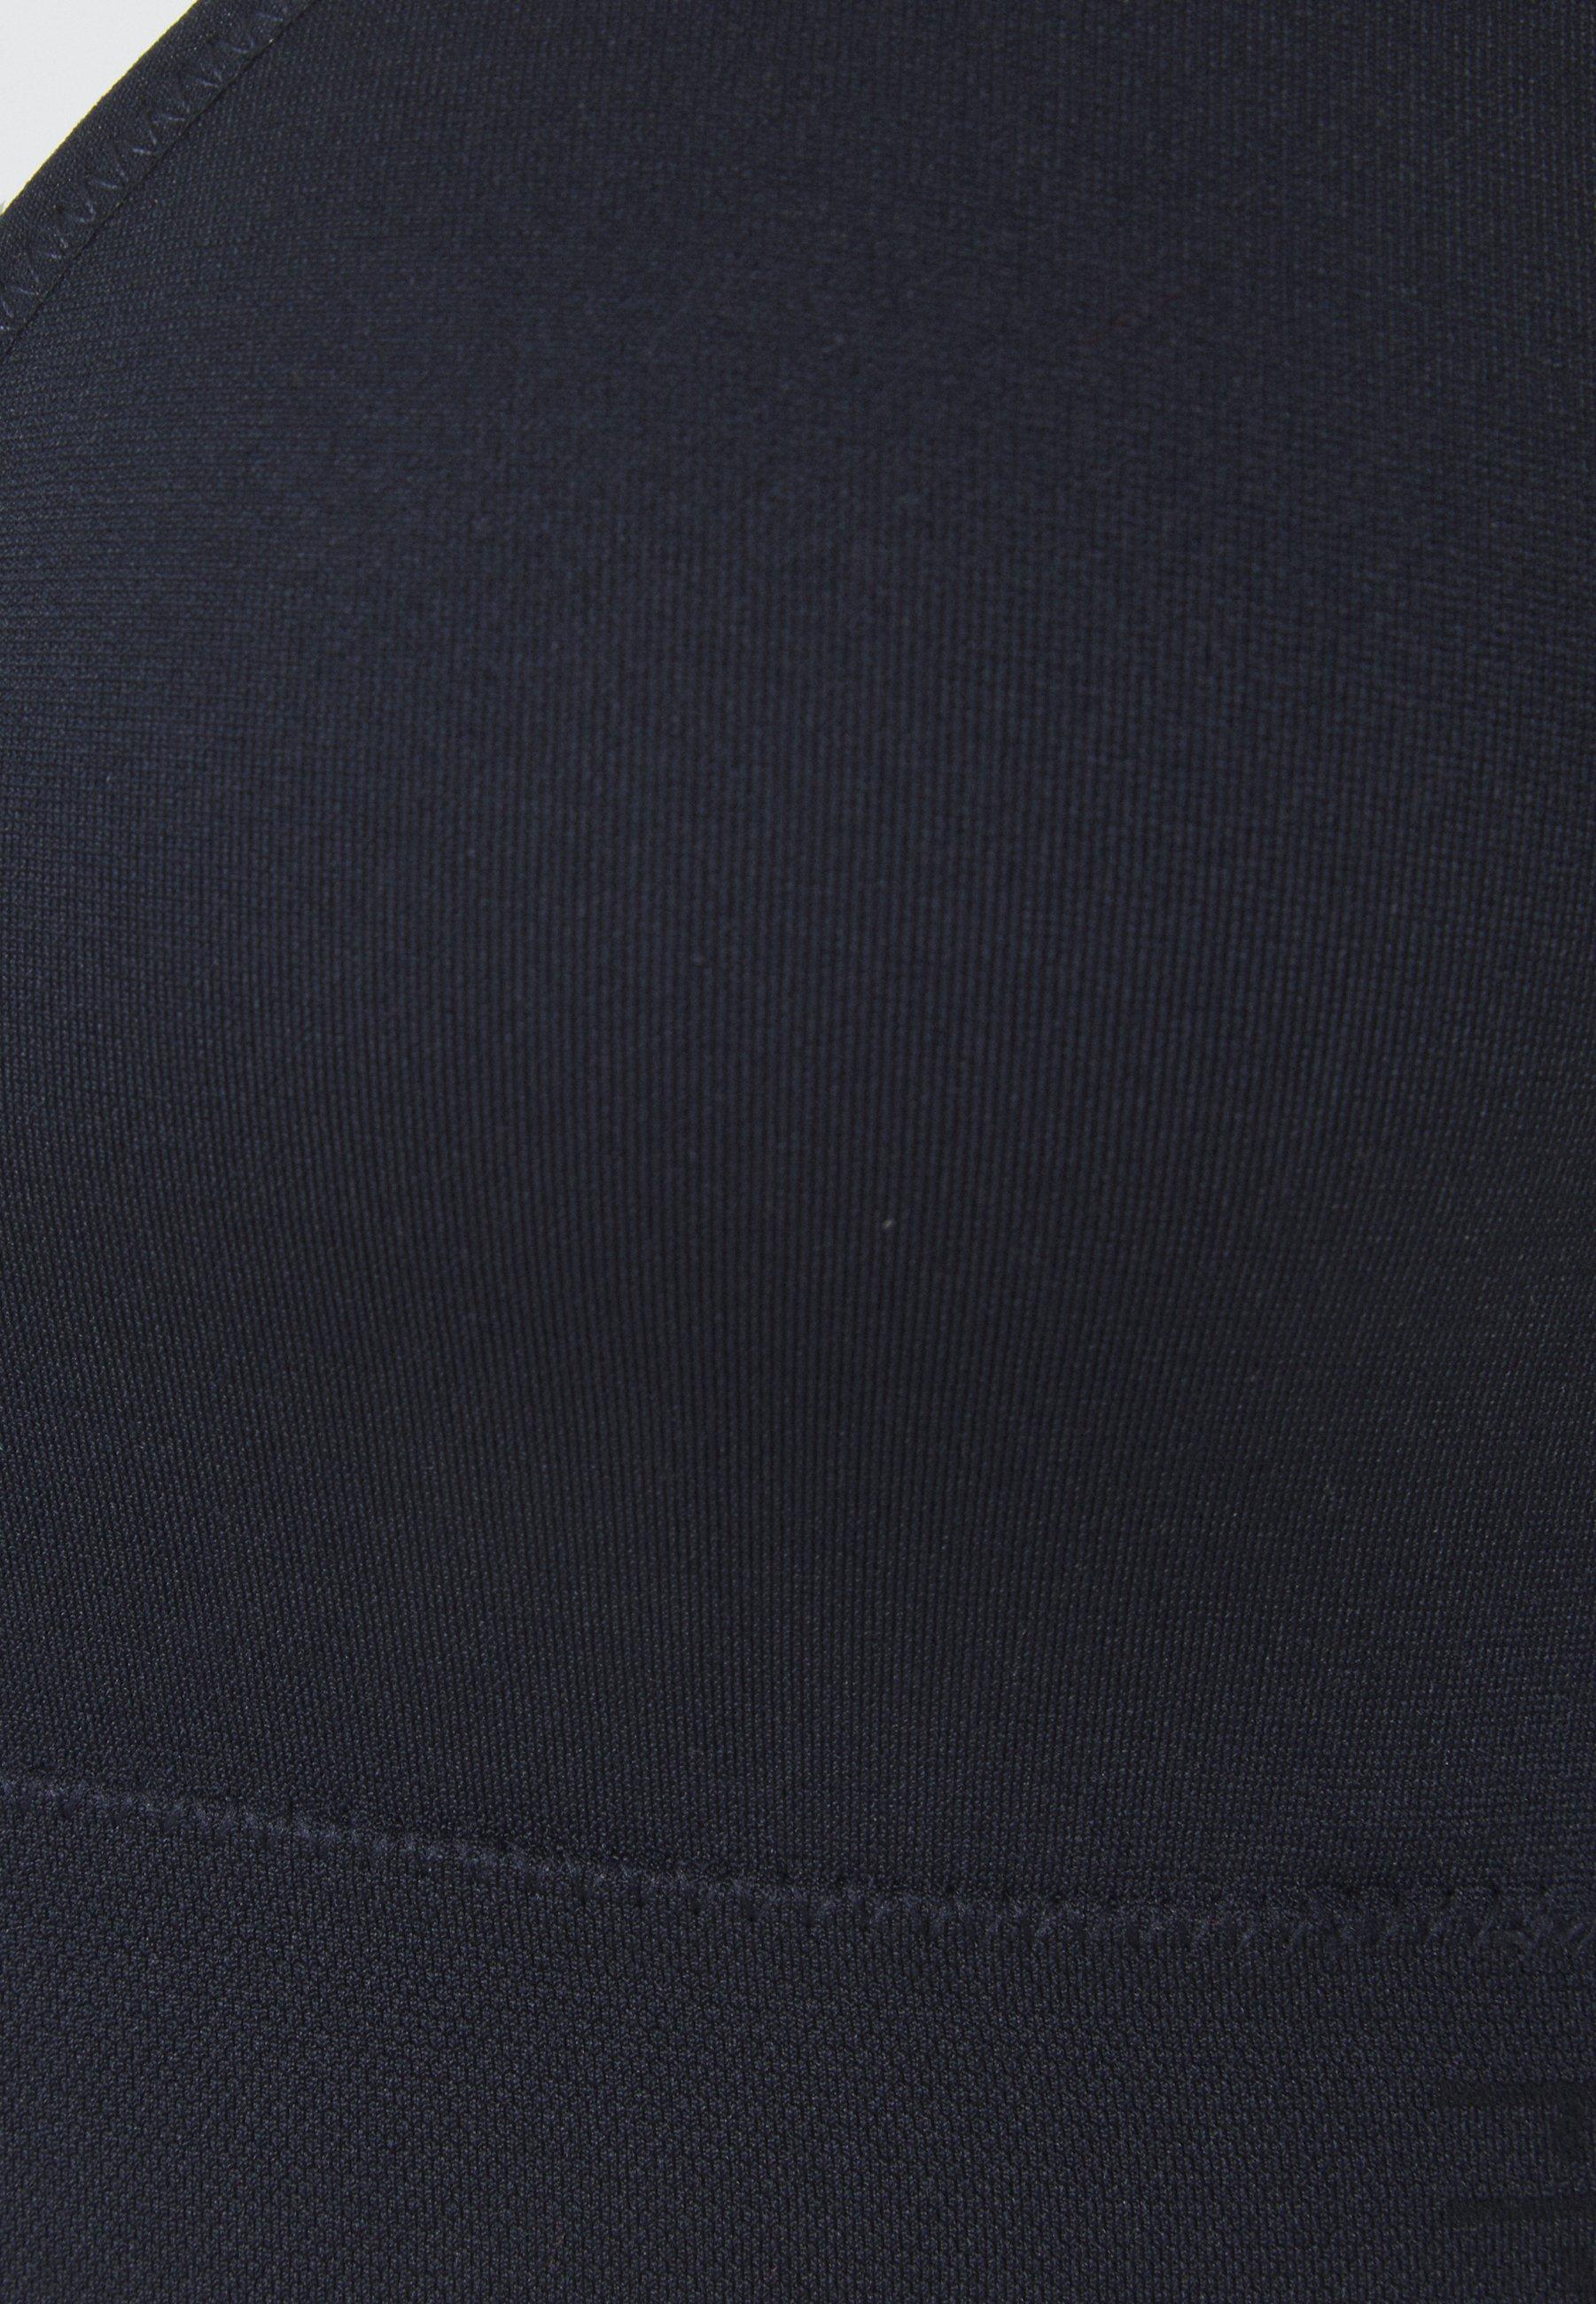 Femme ALWINE - Soutien-gorge triangle